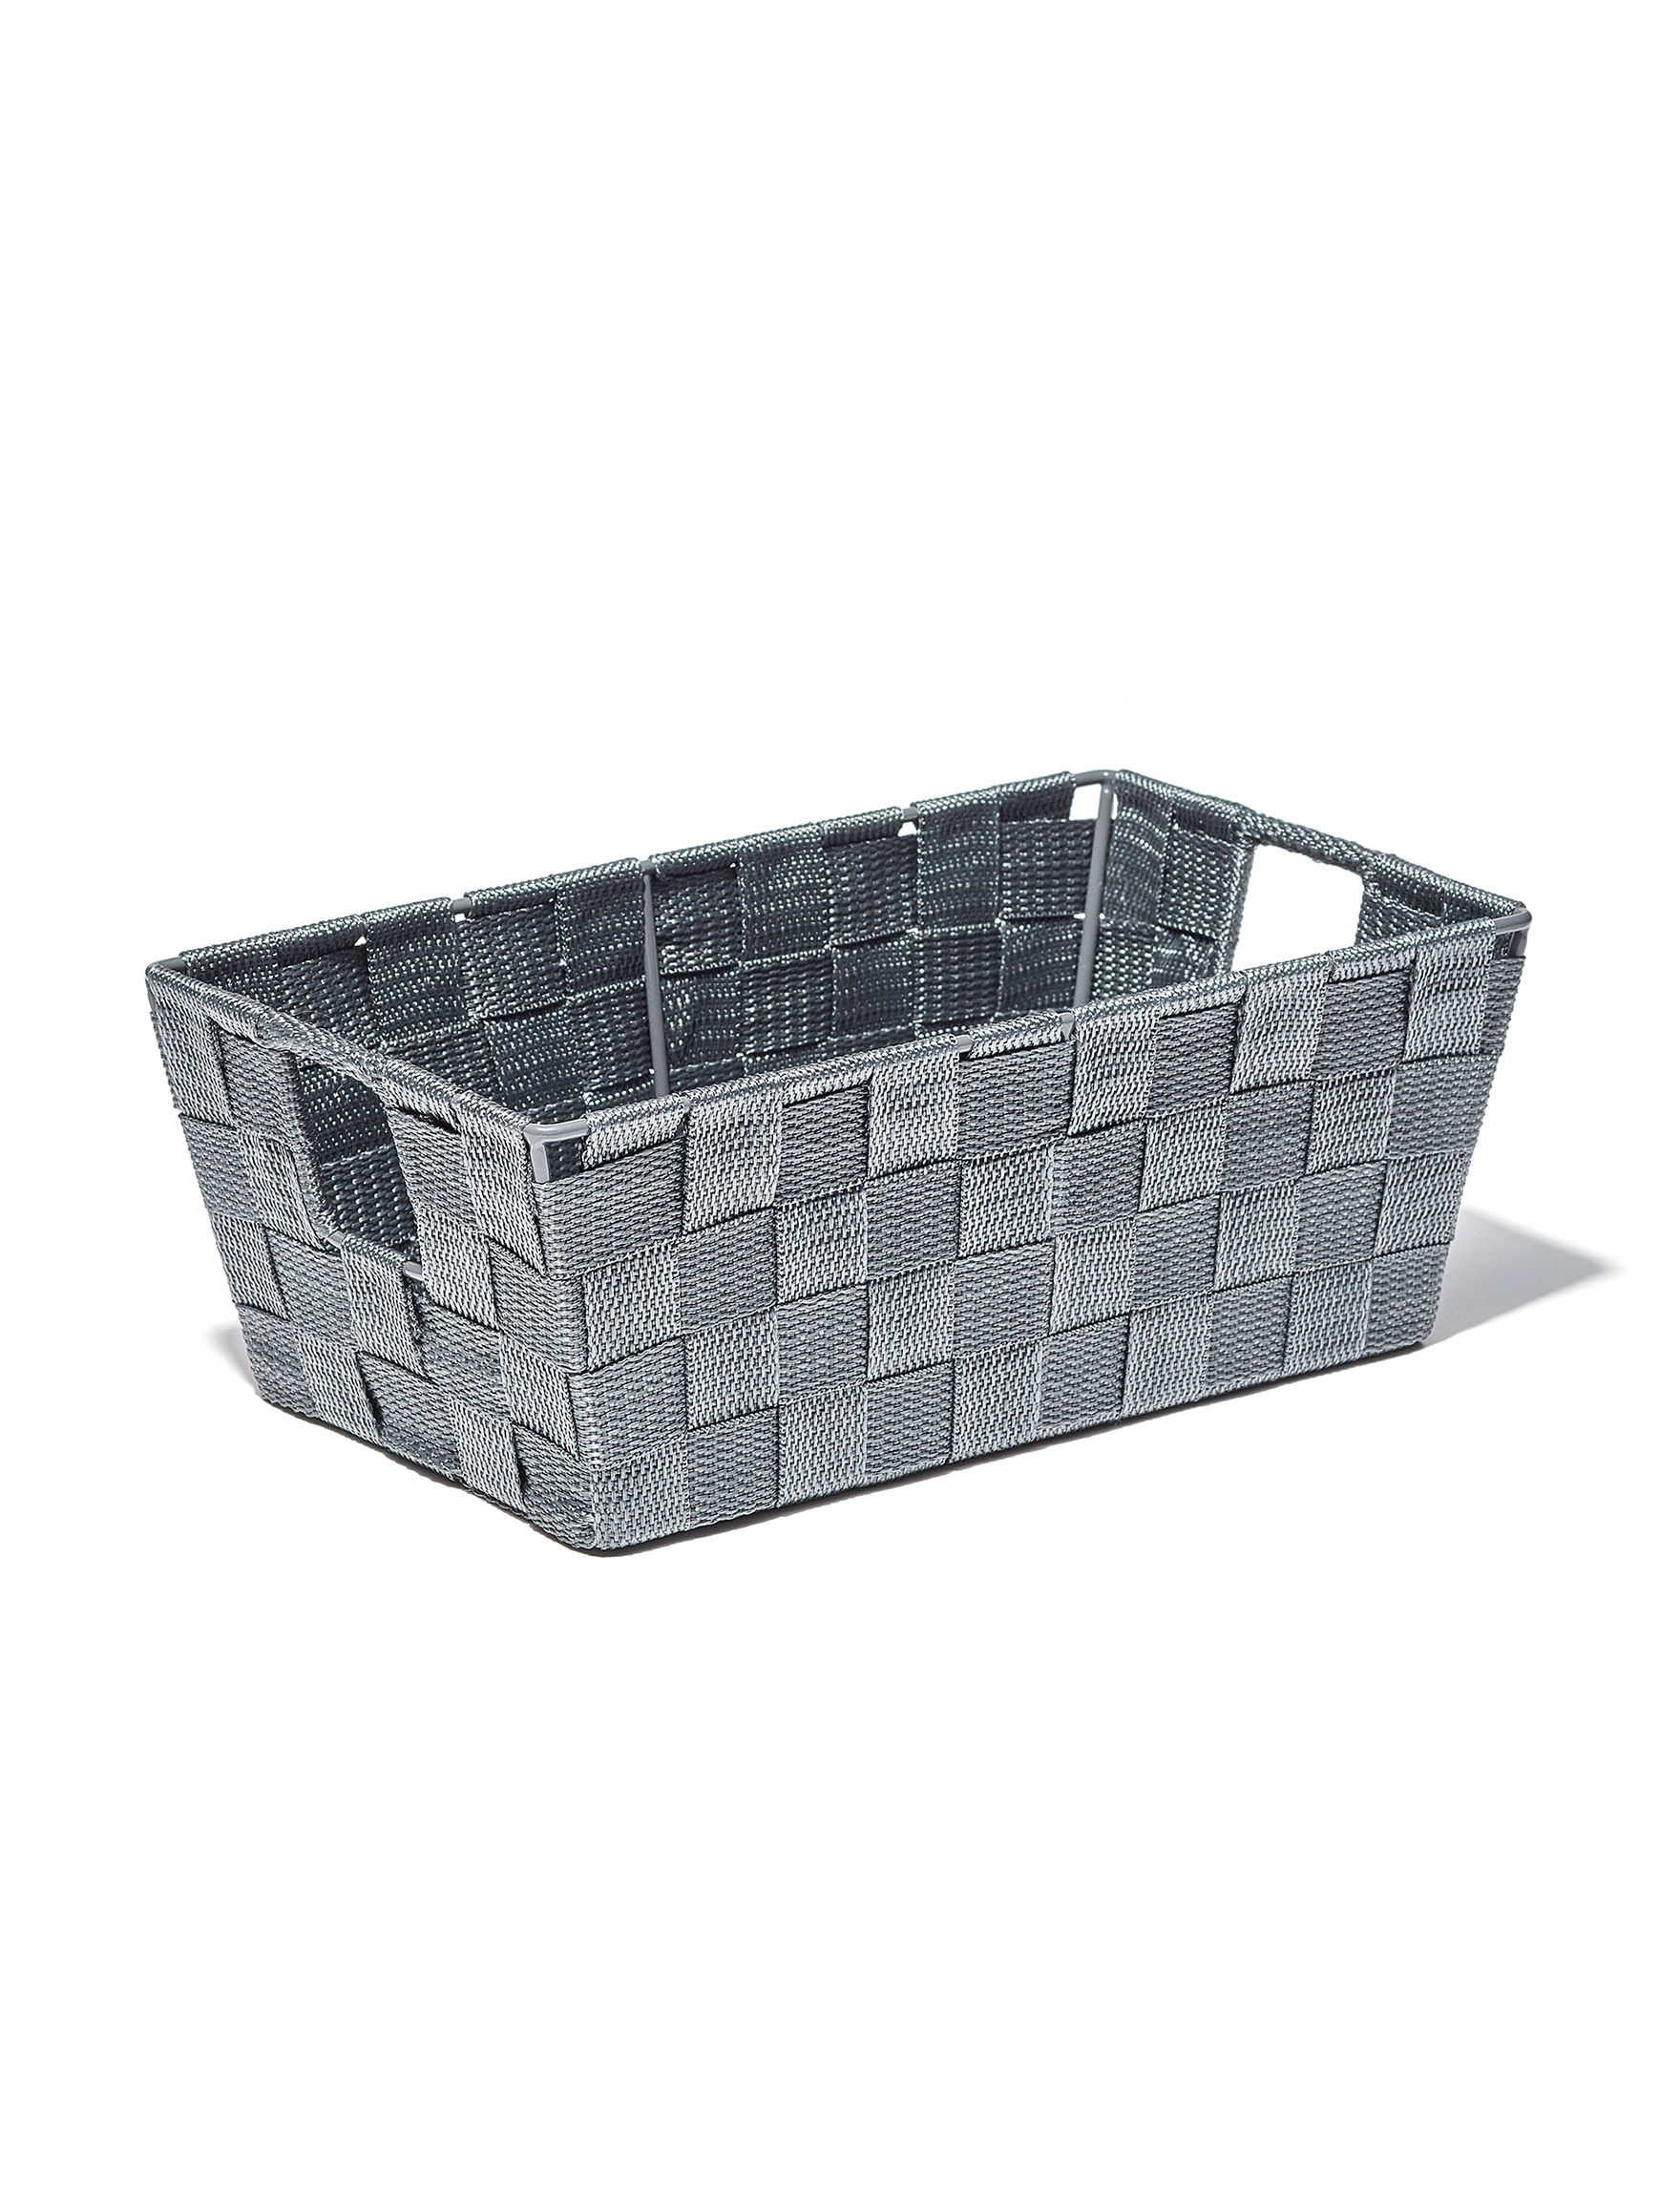 HDS Trading Black Baskets Cubbies & Cubes Storage Bags & Boxes Storage & Organization